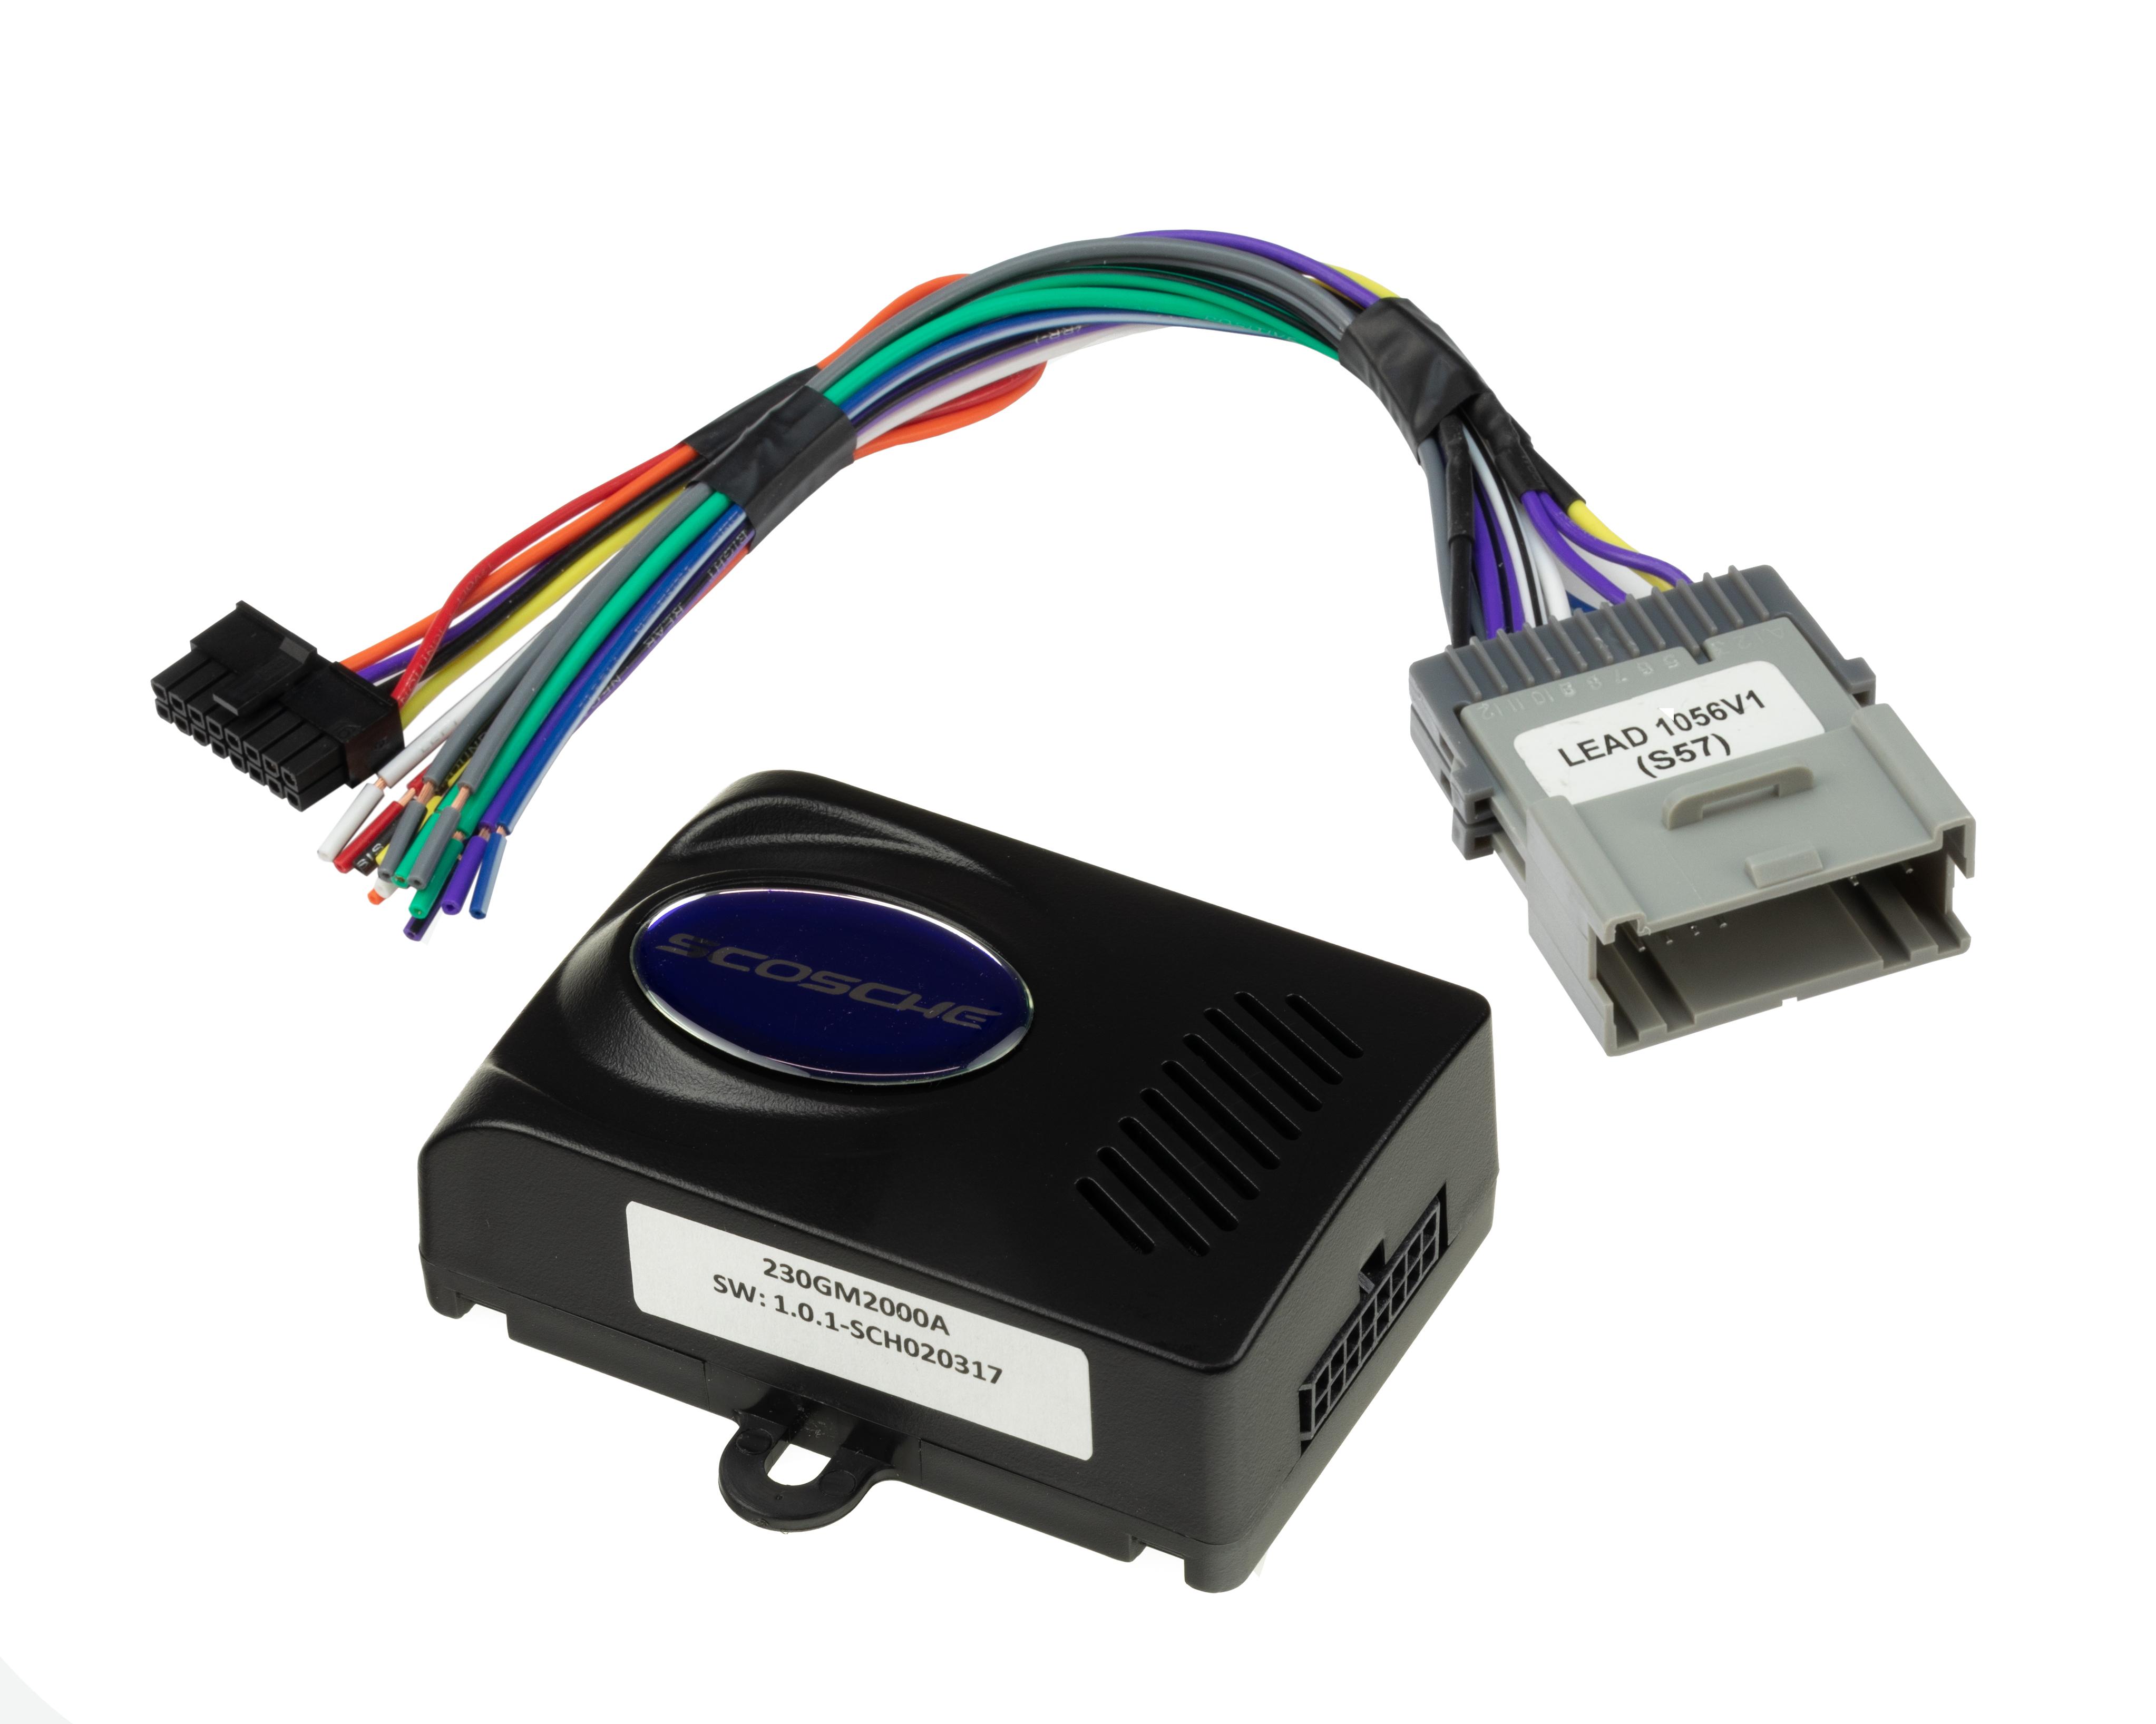 scosche gm2000 car radio stereo wiring harness interface for buick chevrolet  gmc | ebay  ebay